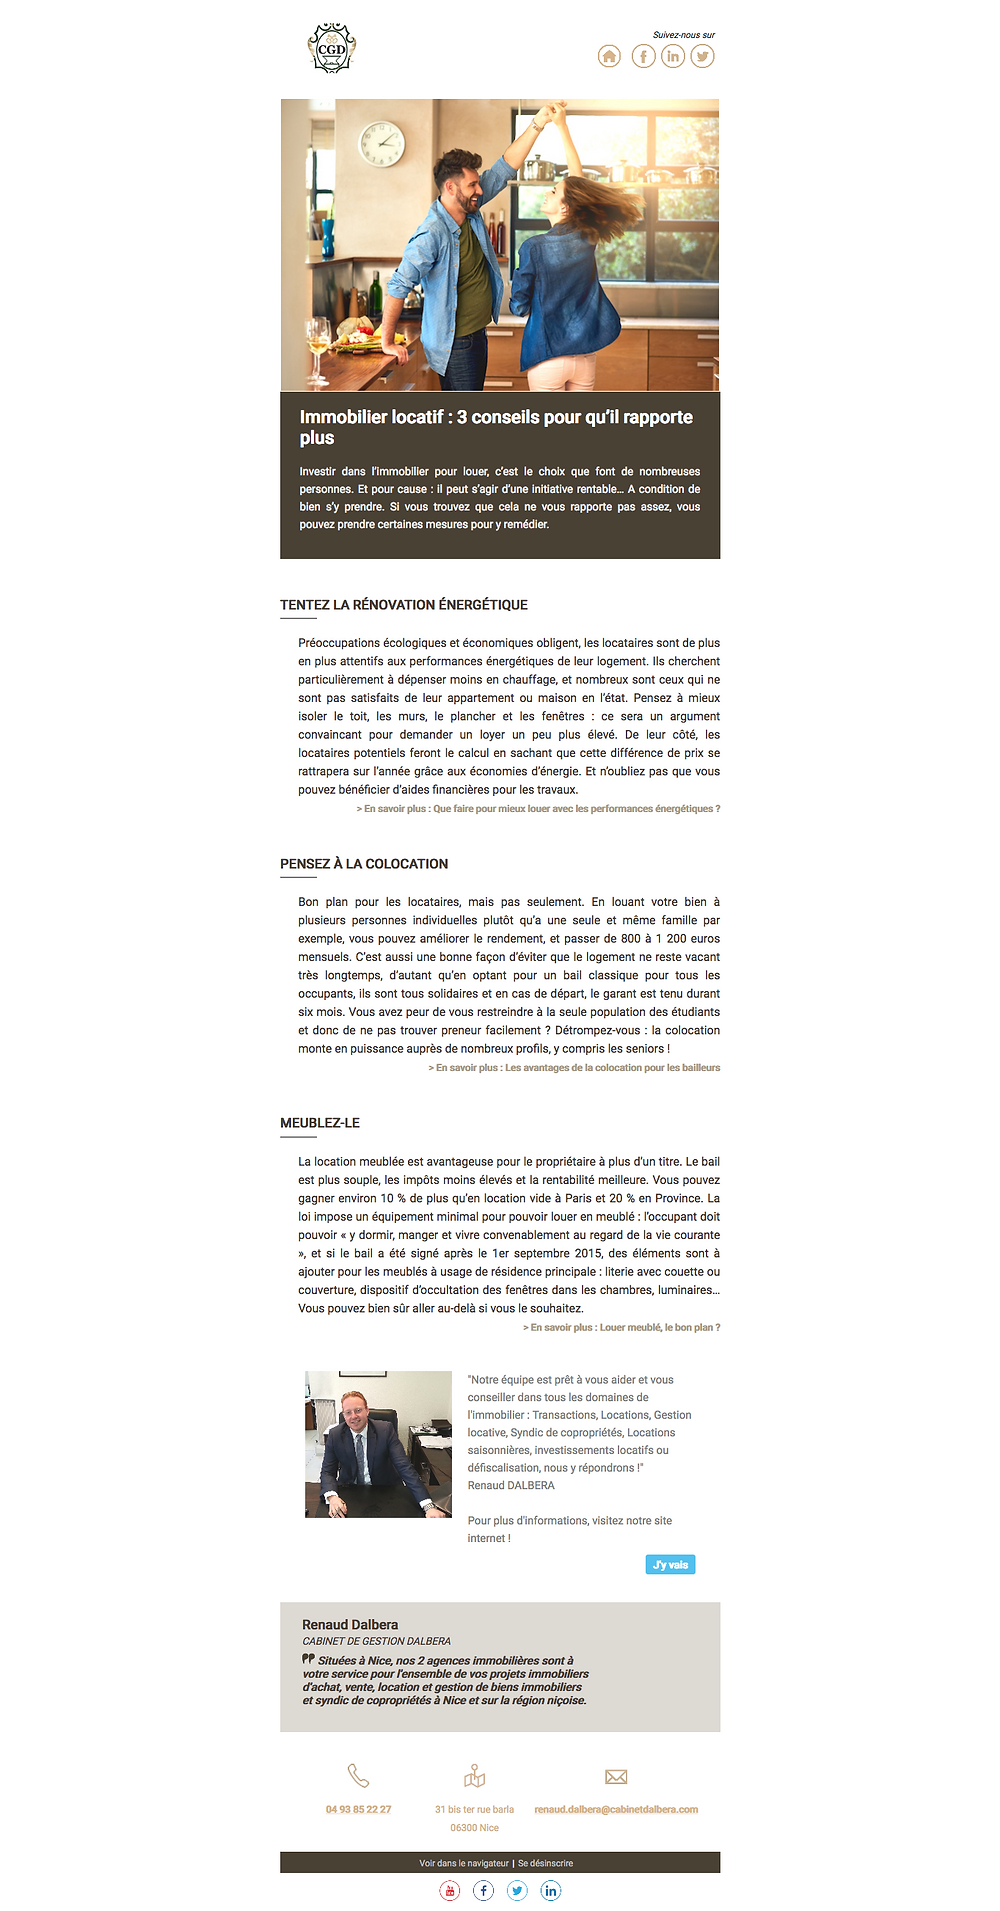 immobilier locatif - colocation -